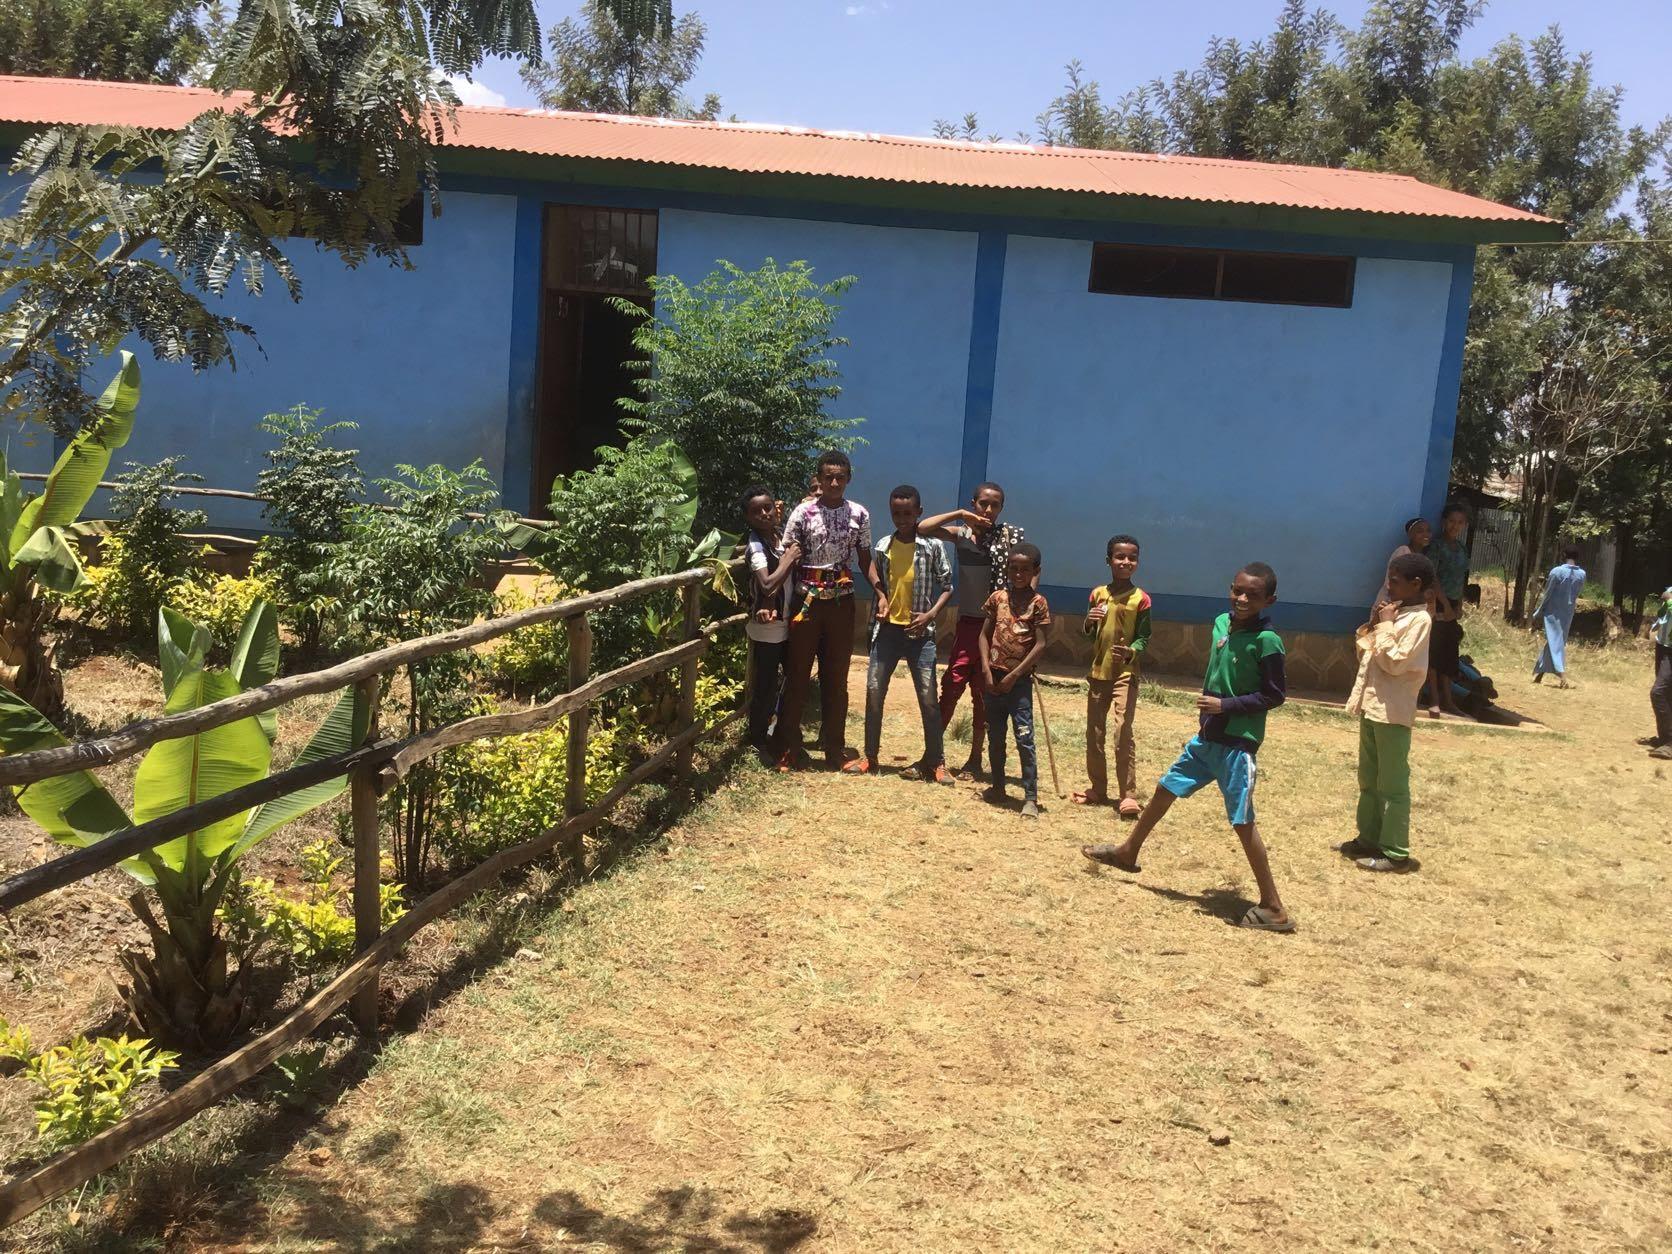 Wotet Abay Elementary School